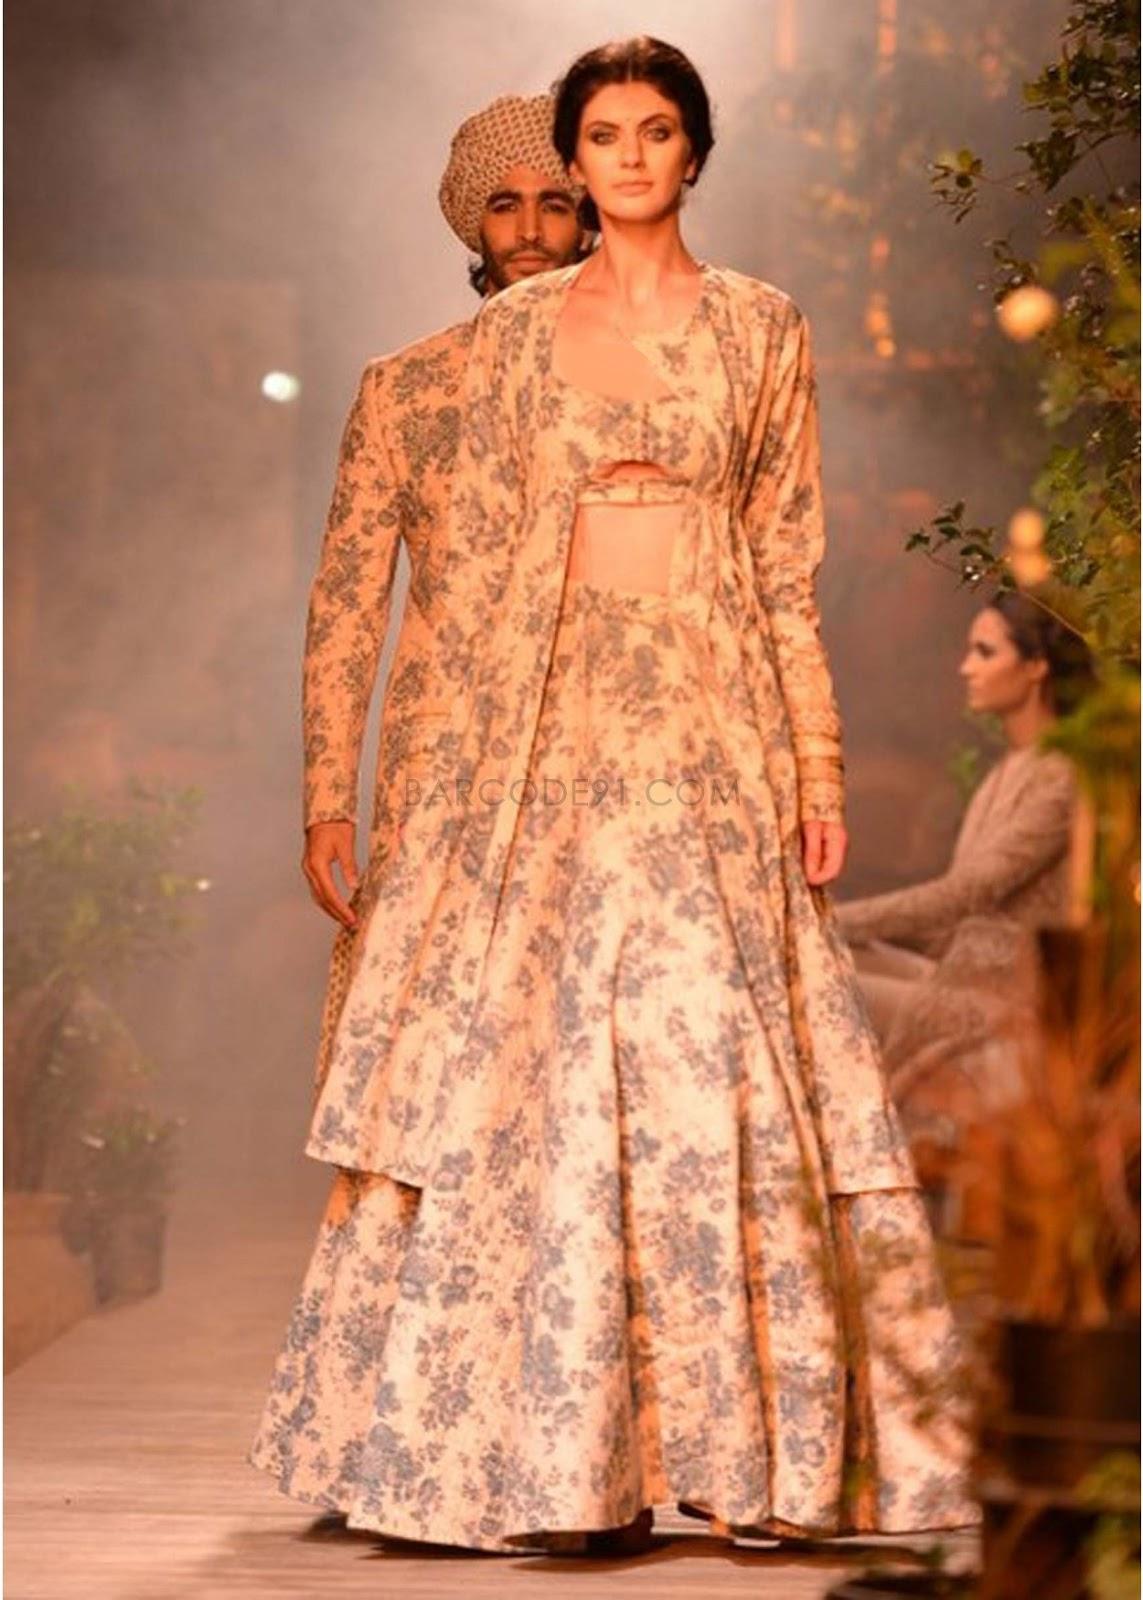 Pin by Maggie on Pakistani fashion | Pinterest Sabyasachi Bridal Collection 2013